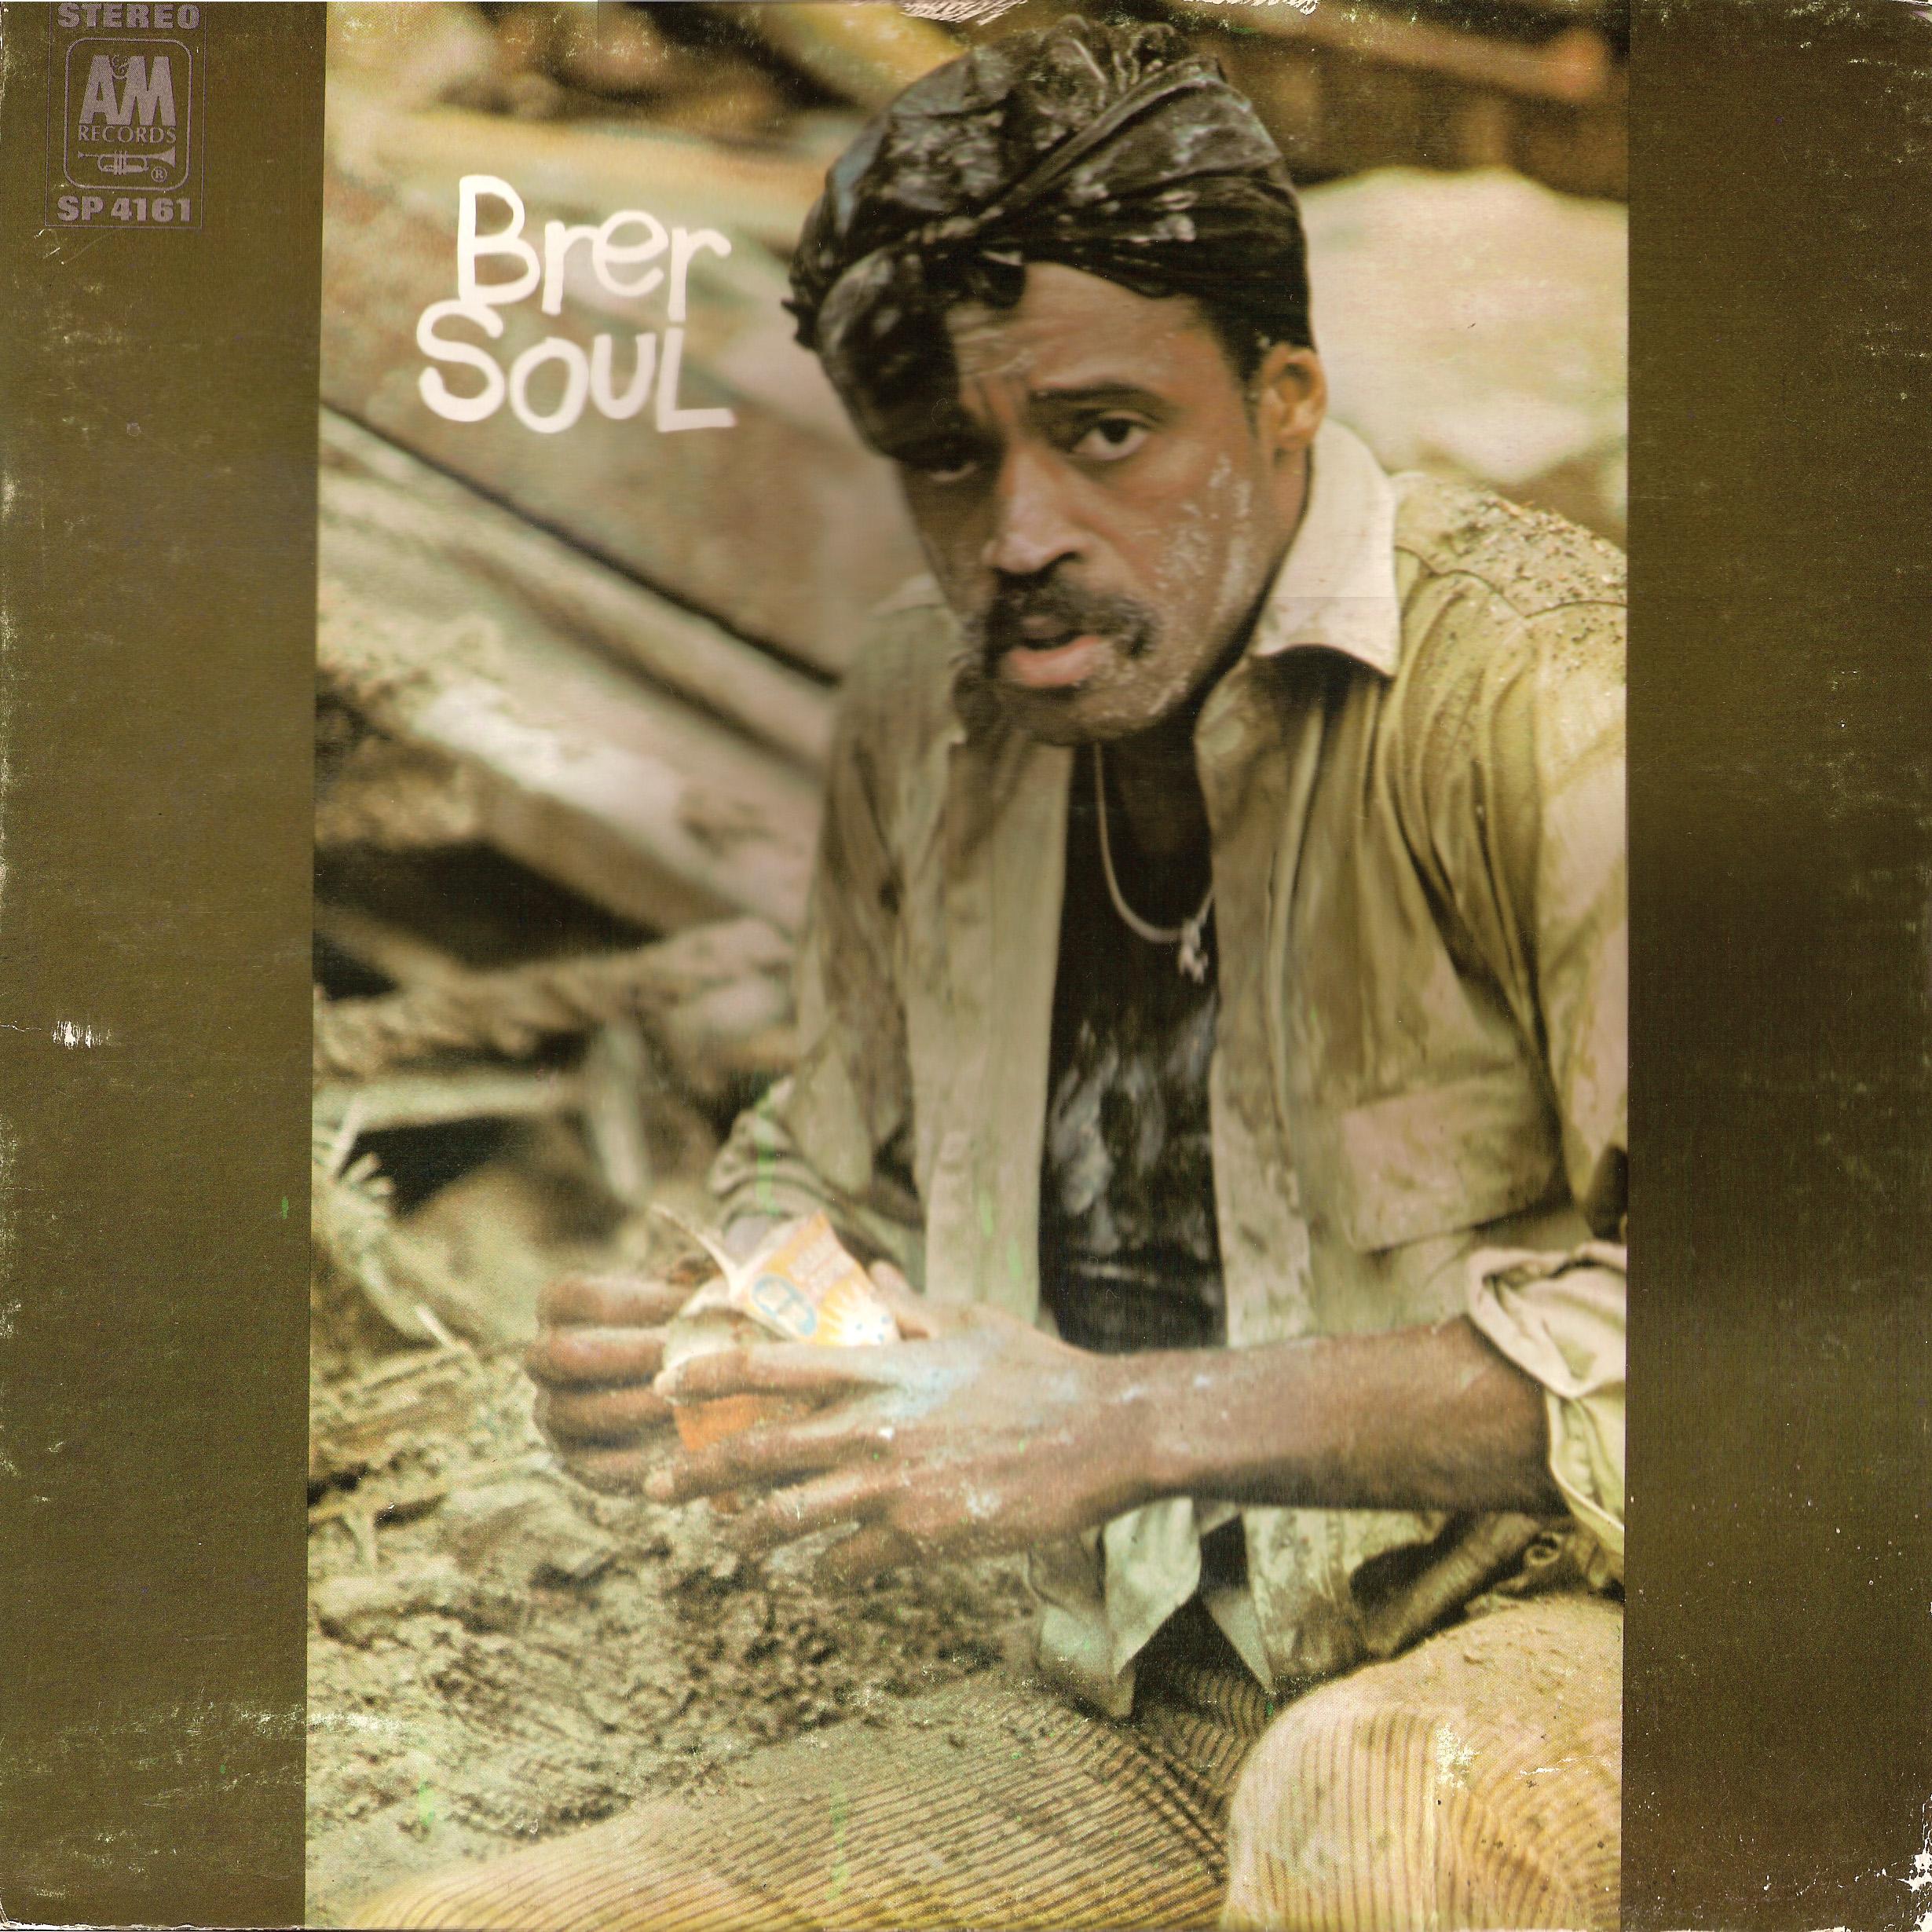 Melvin Van Peebles - Brer Soul